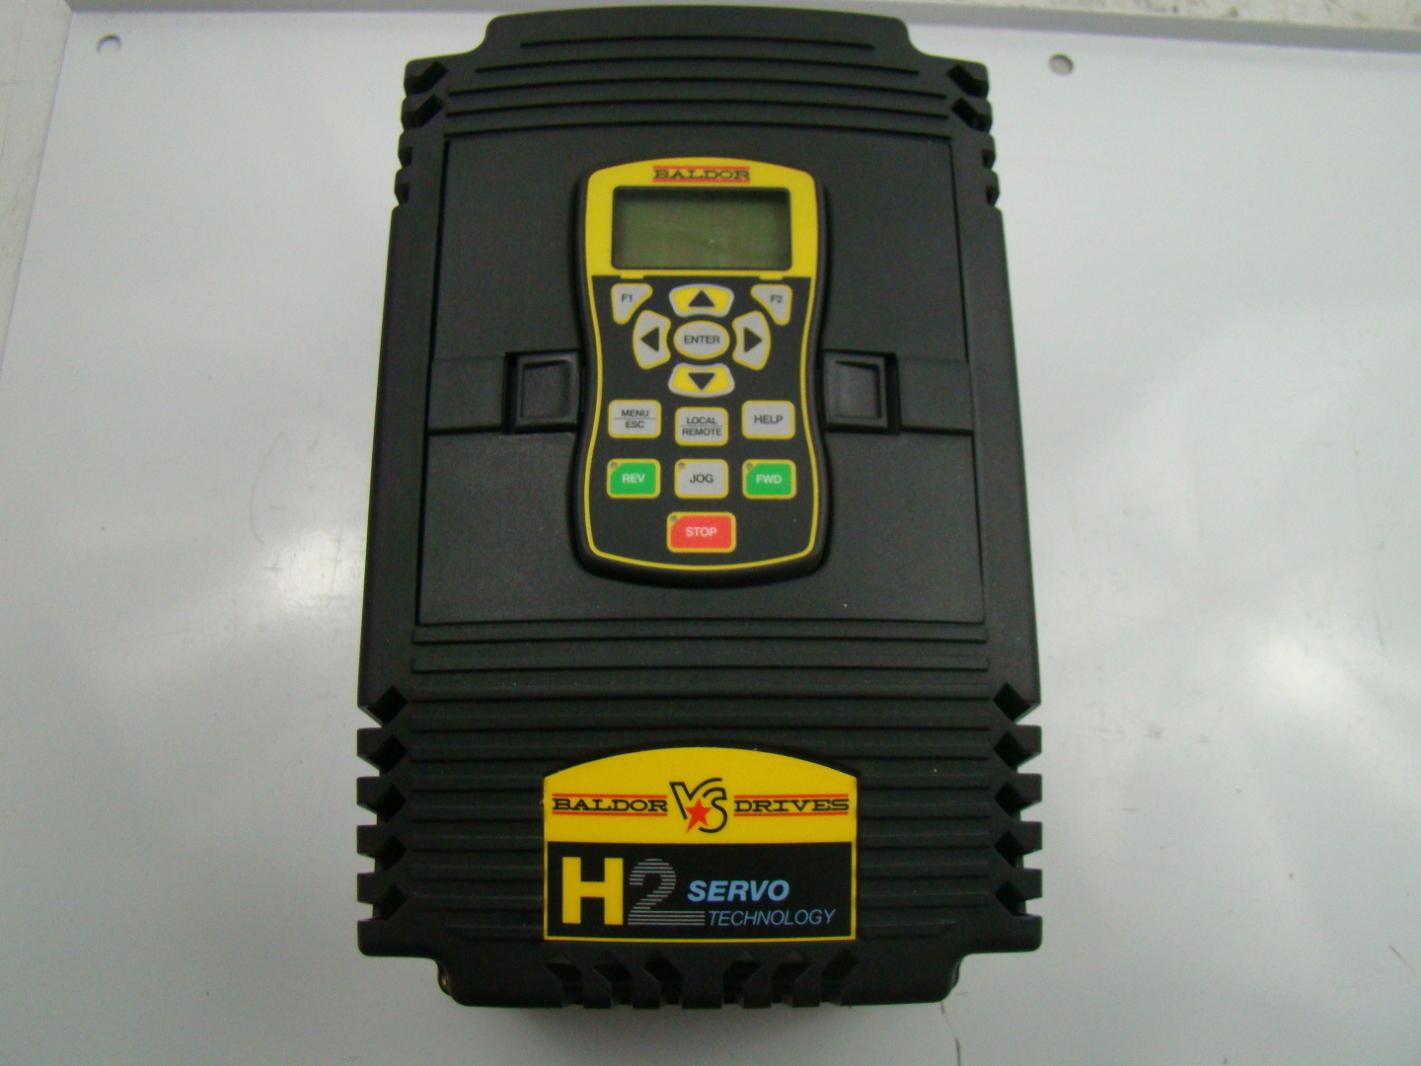 Baldor Drives 240VAC AC Servo Control VS1SD2A4 1B eBay #BE930D